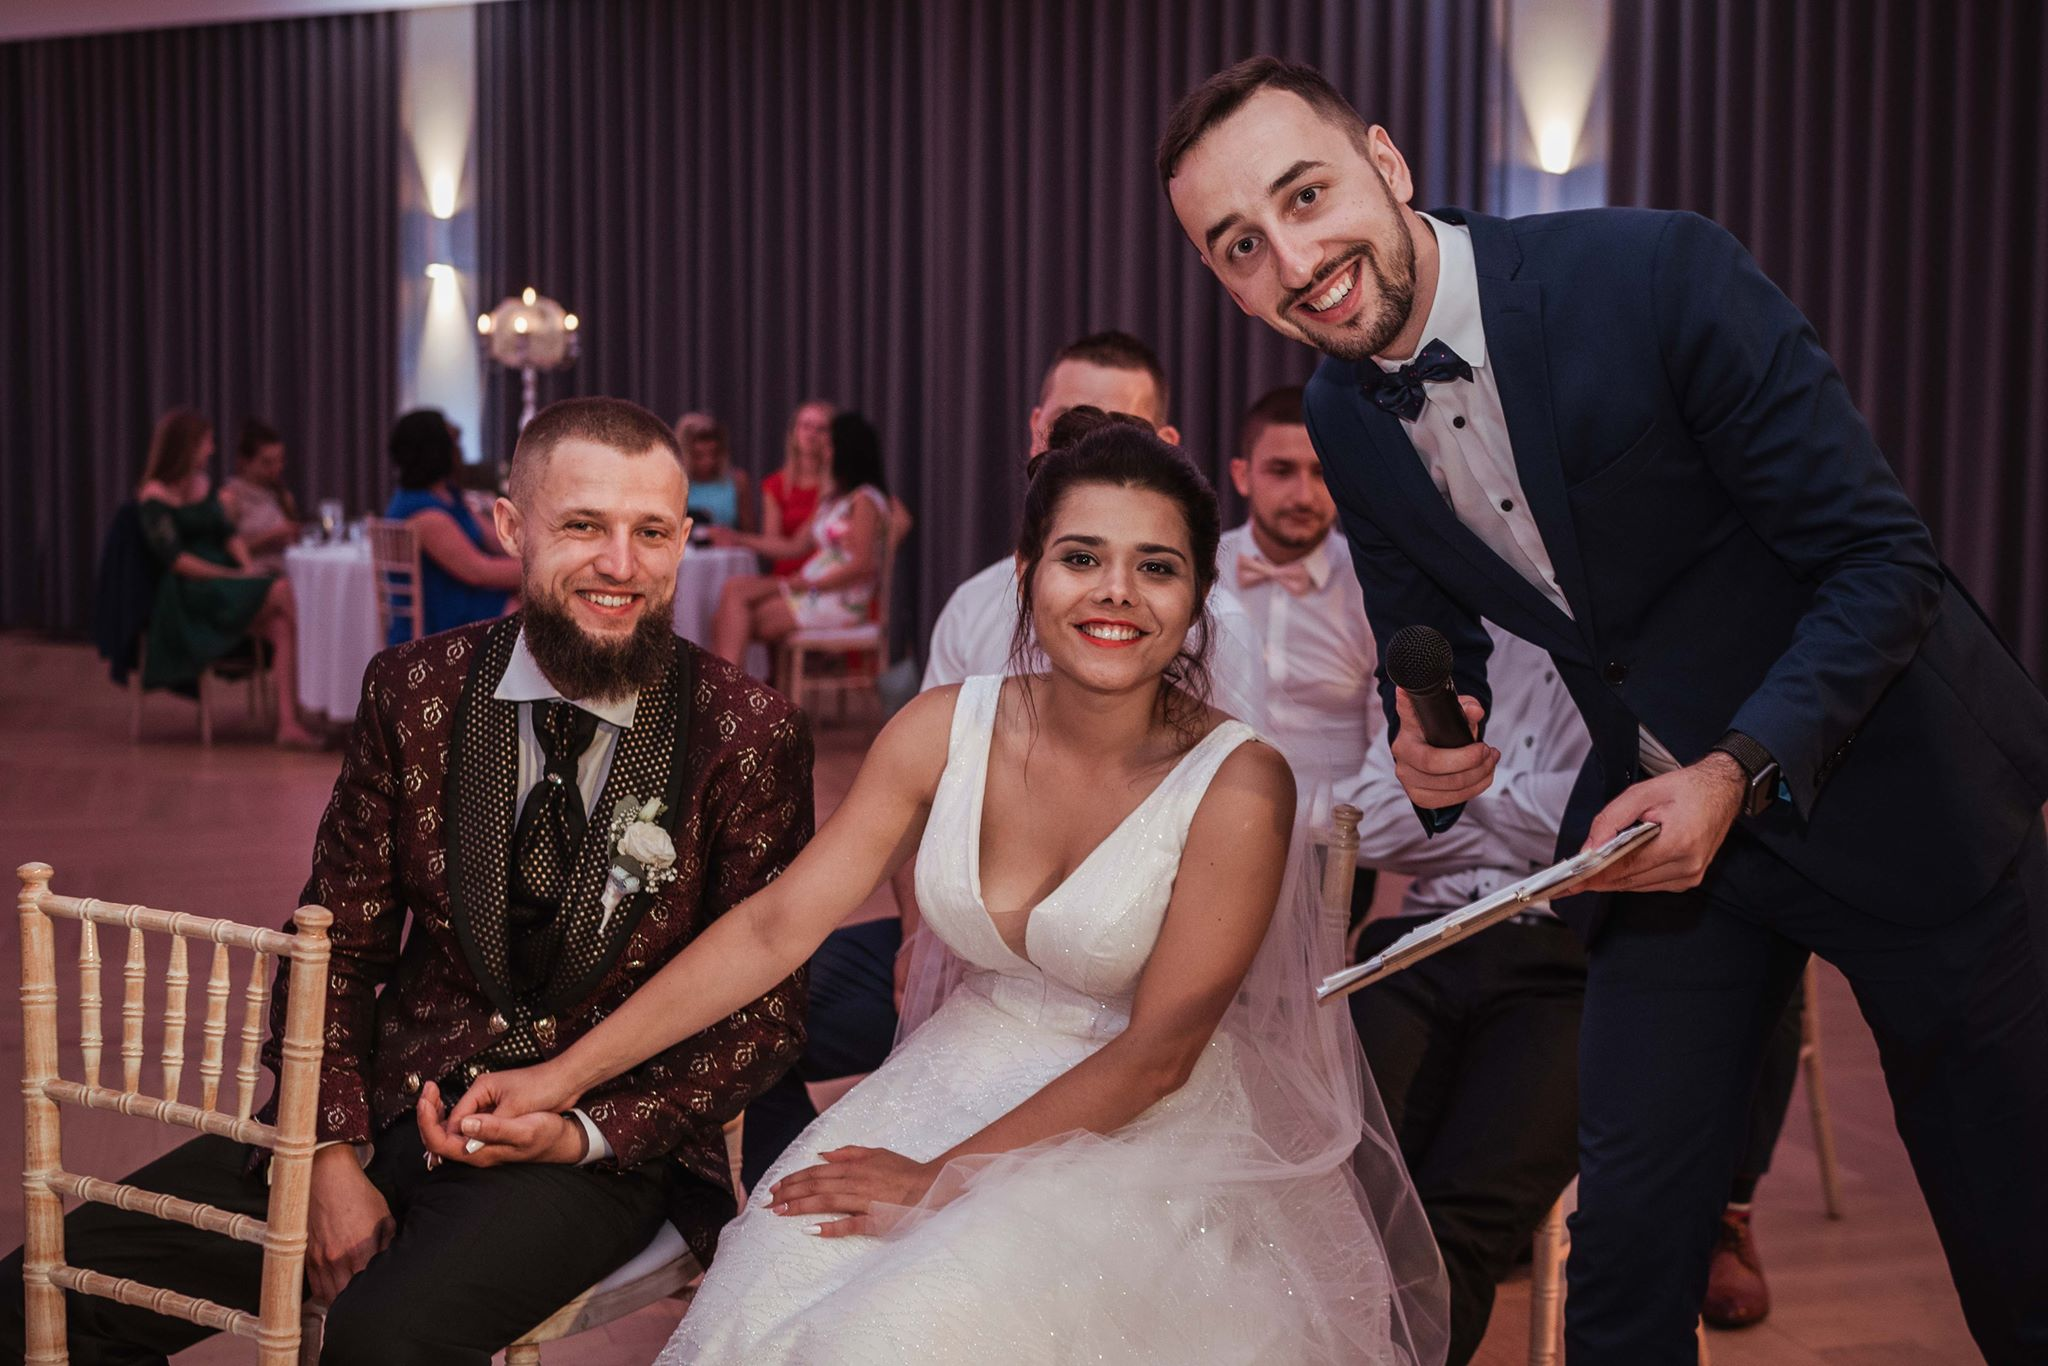 wedding-dj-moderator-starejsi-svadobny-kocjpg